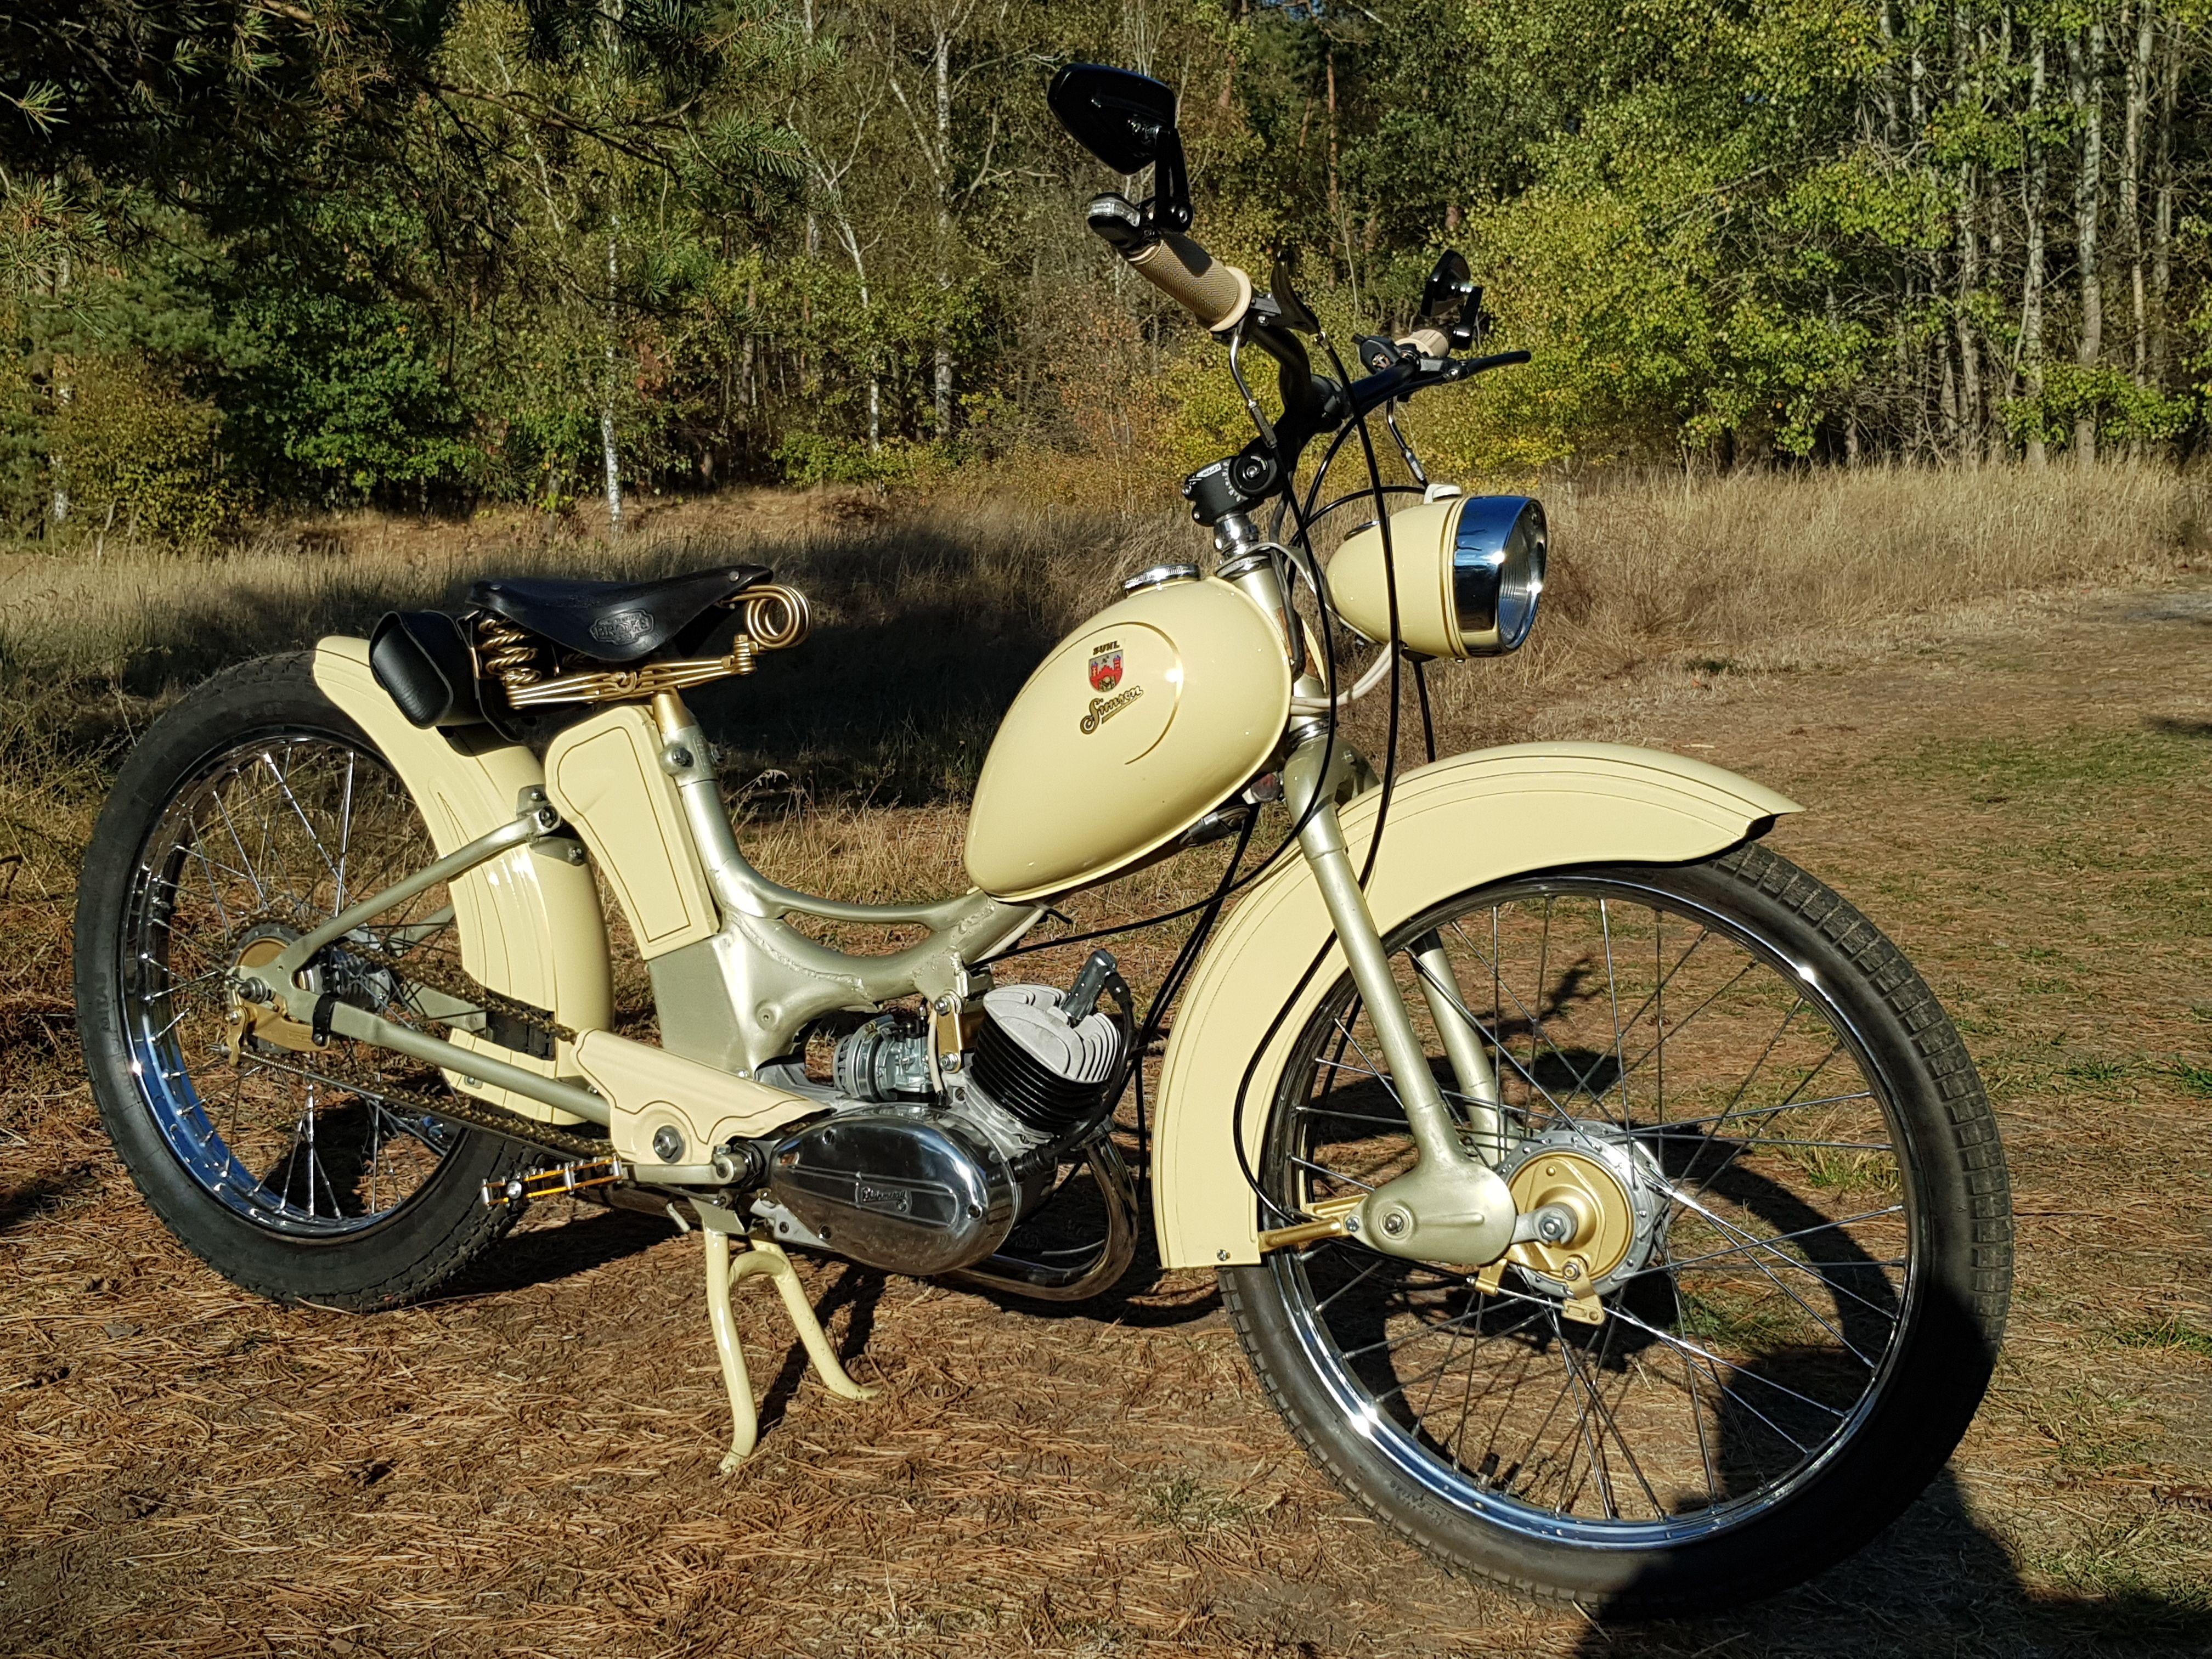 Pin Von Todd Eddings Auf Mopeds Simson Sr2 Motorad Und Simson